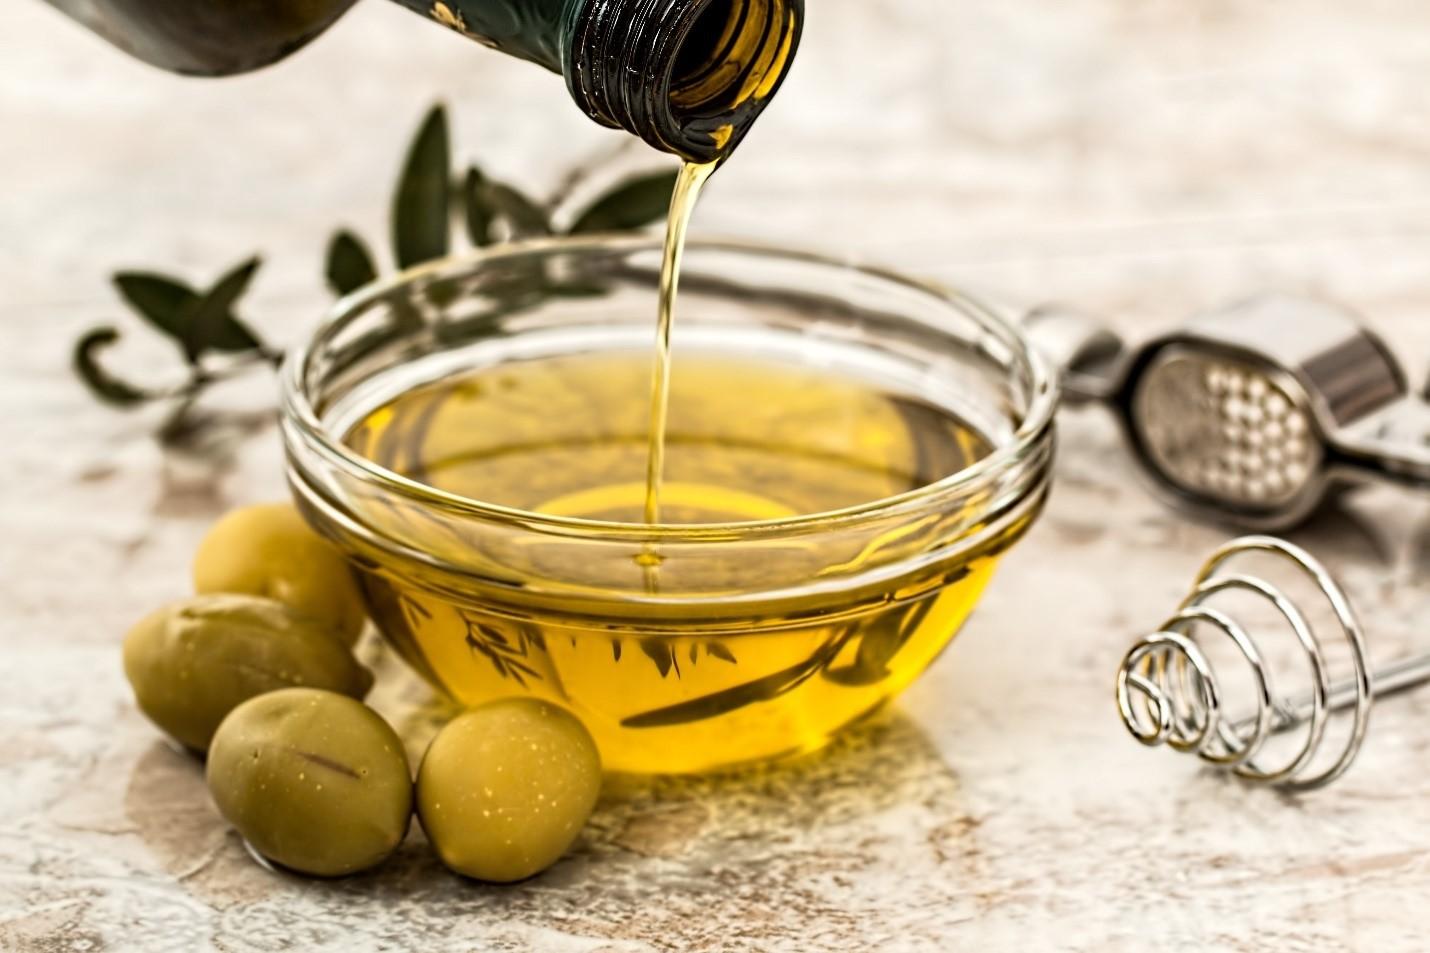 omega-3 fatty acids and acne